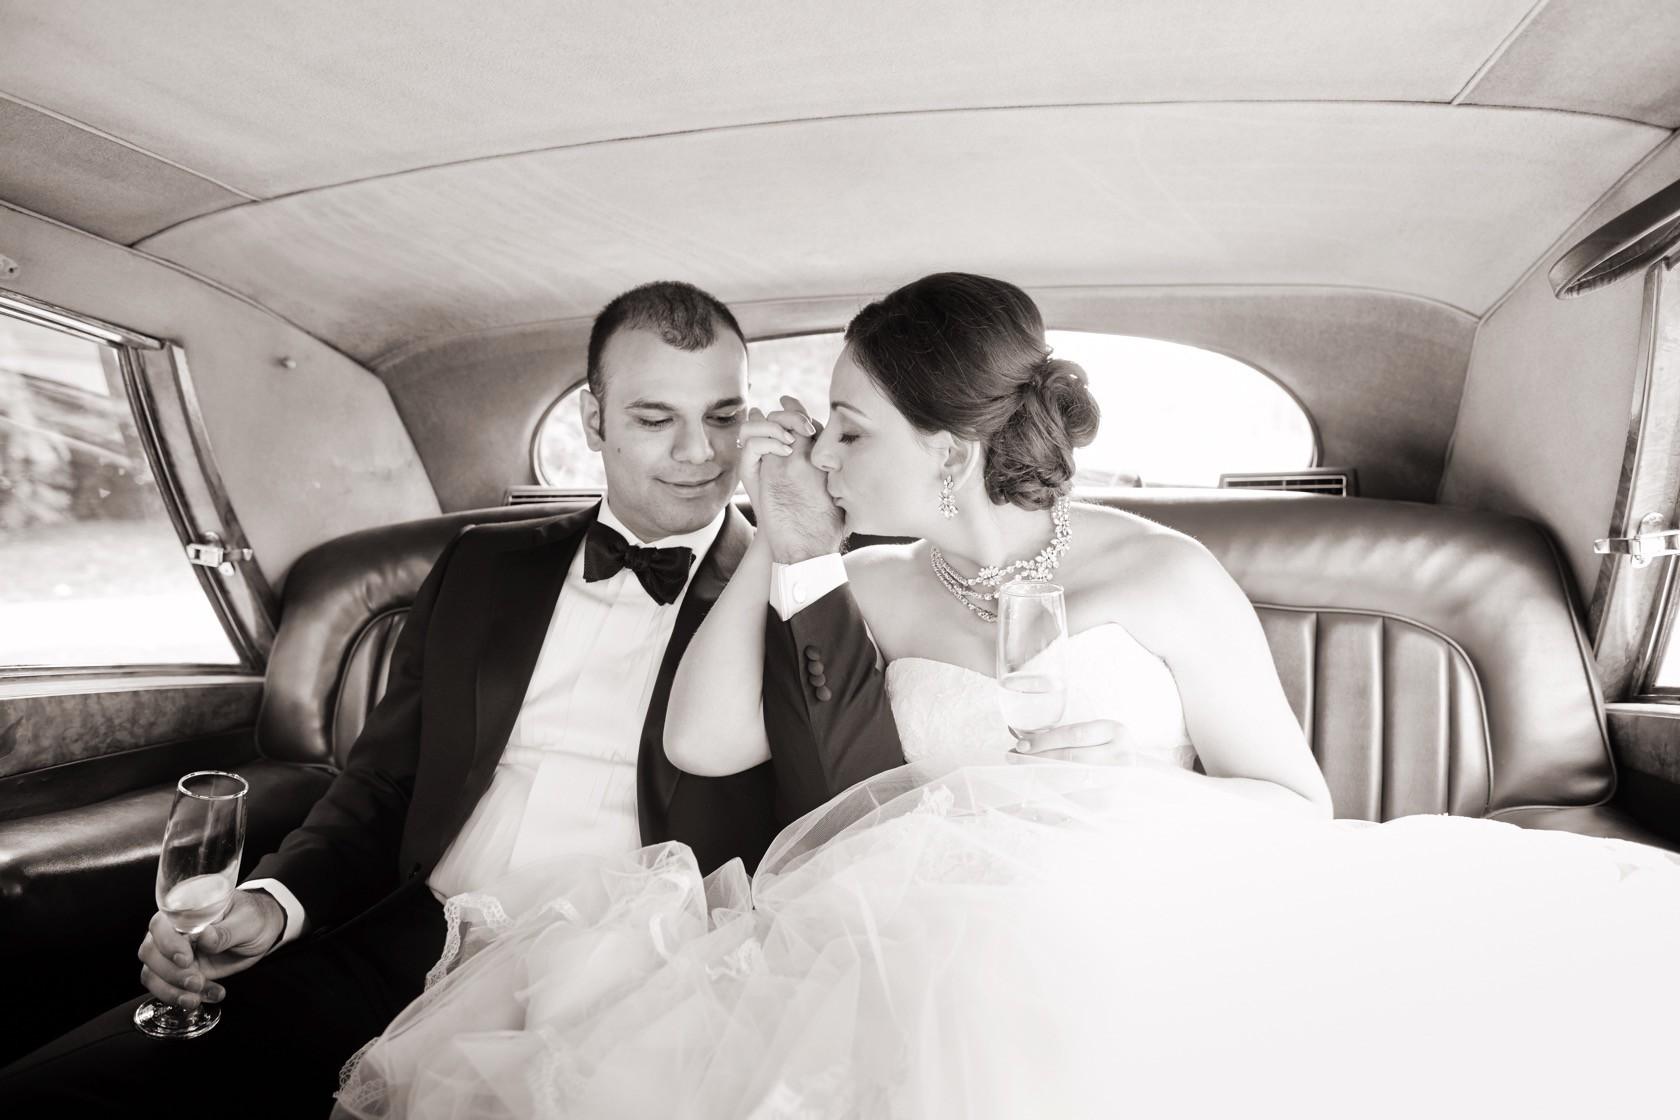 stephen sager photography 0061 fine art wedding photography